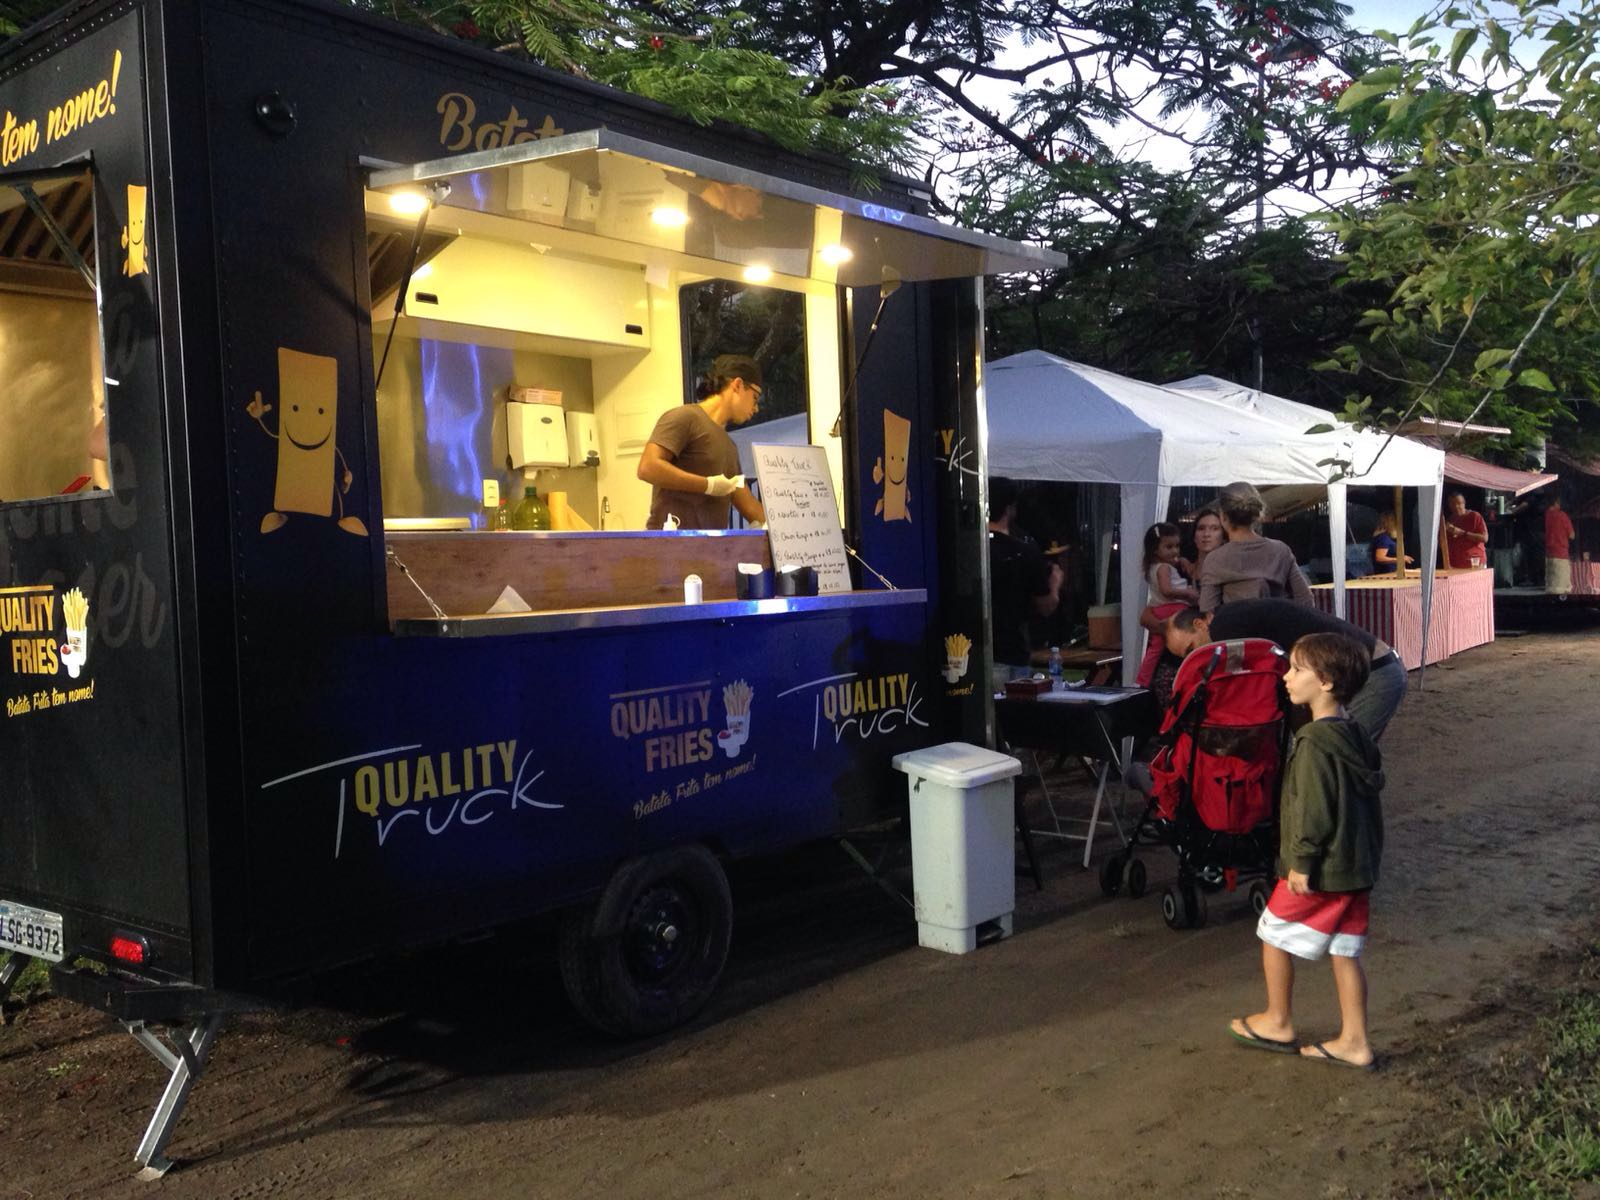 Na Cidade: Food Truck Music Festival